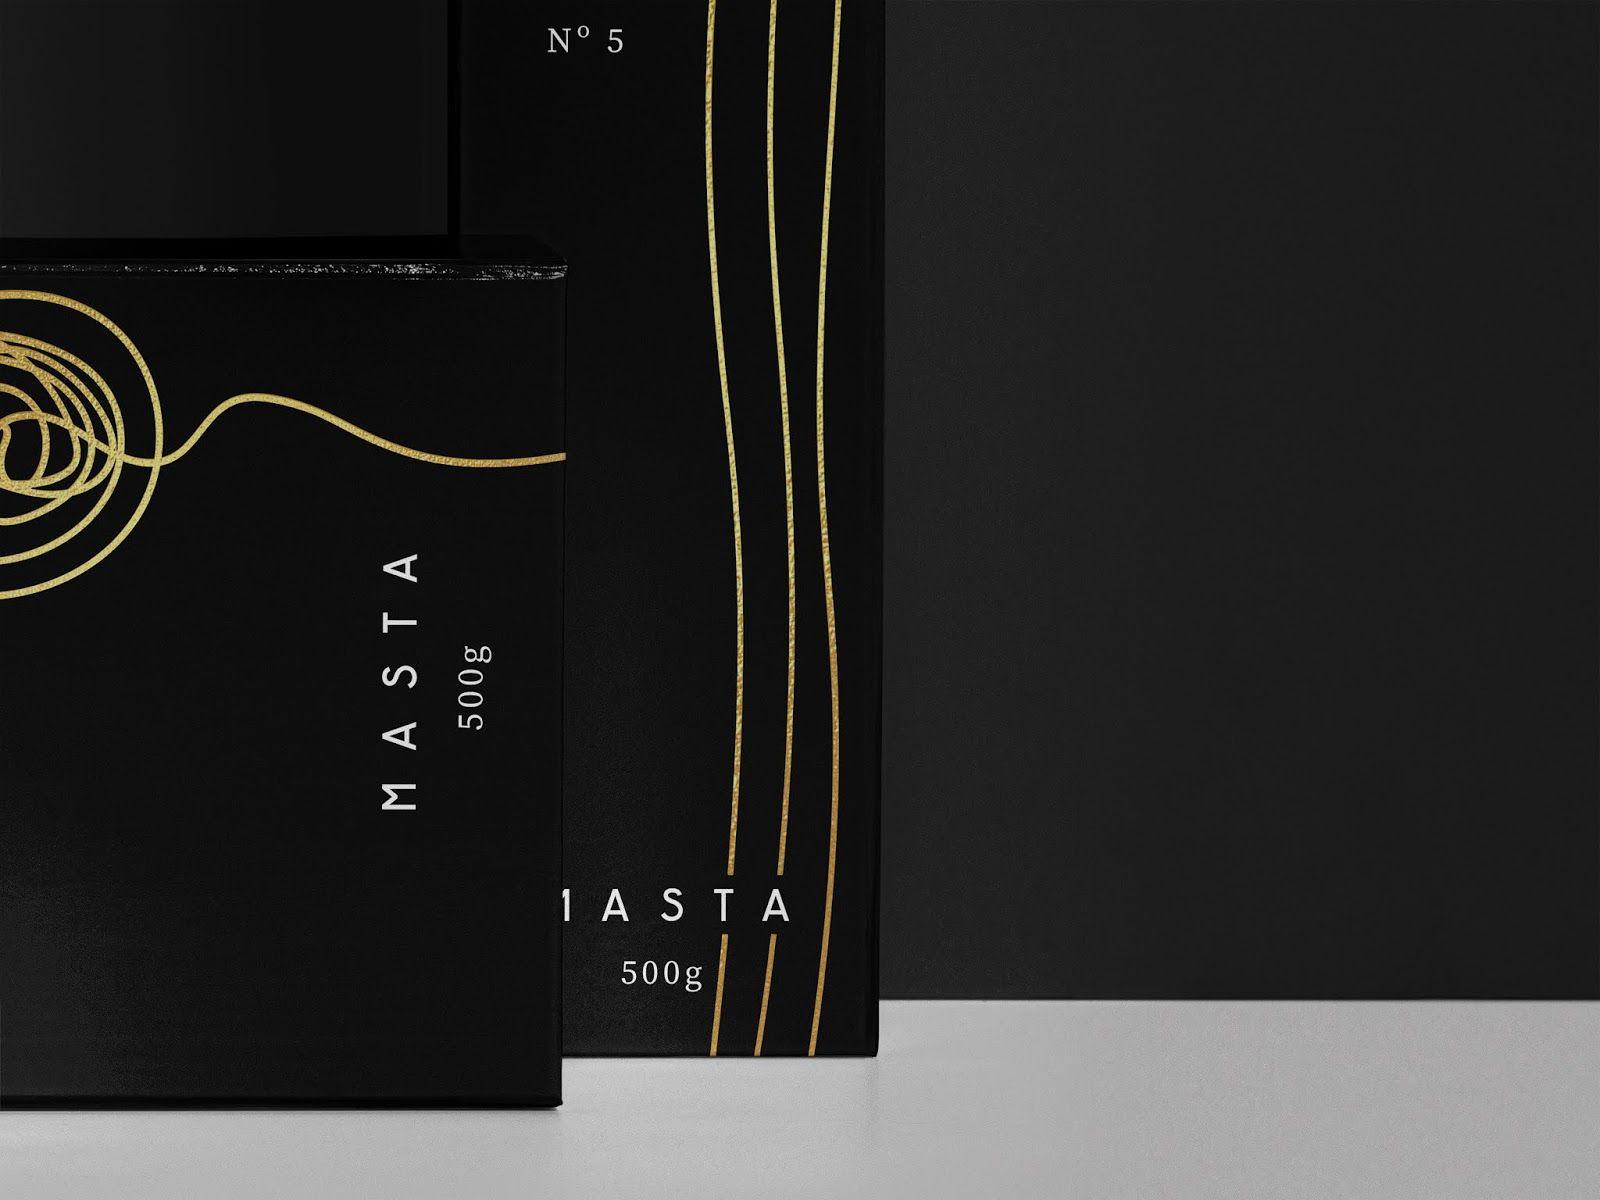 Masta (pâtes) I Design (concept) : Mariana Beck, Brésil (février 2021)